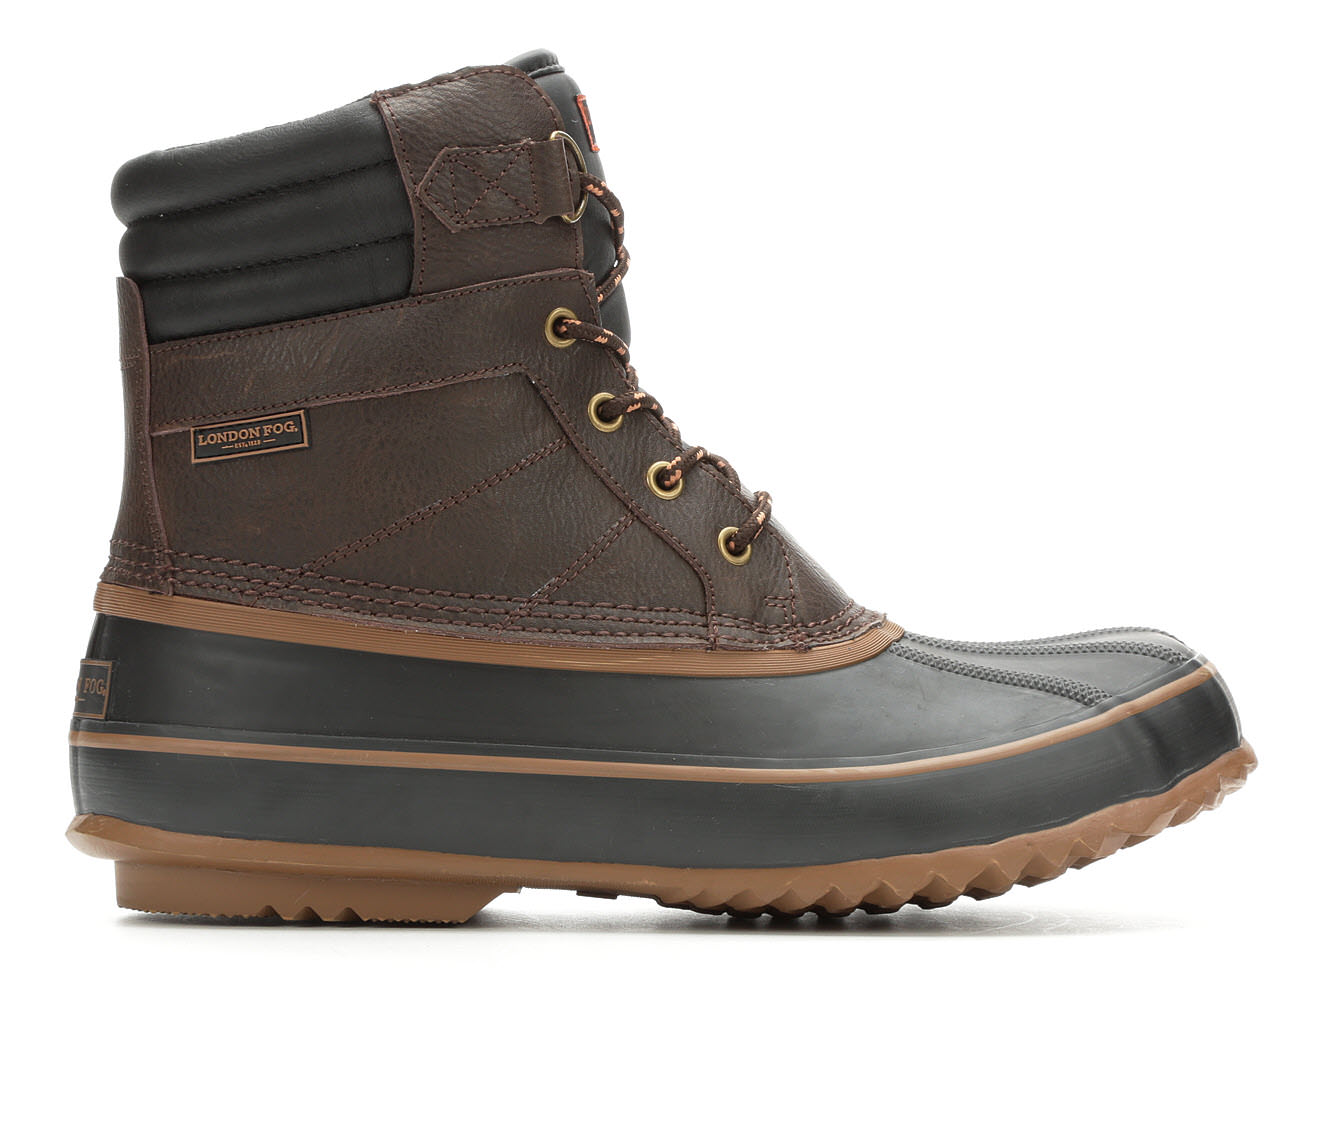 London Fog Ashford 3 Men's Boots (Brown Faux Leather)